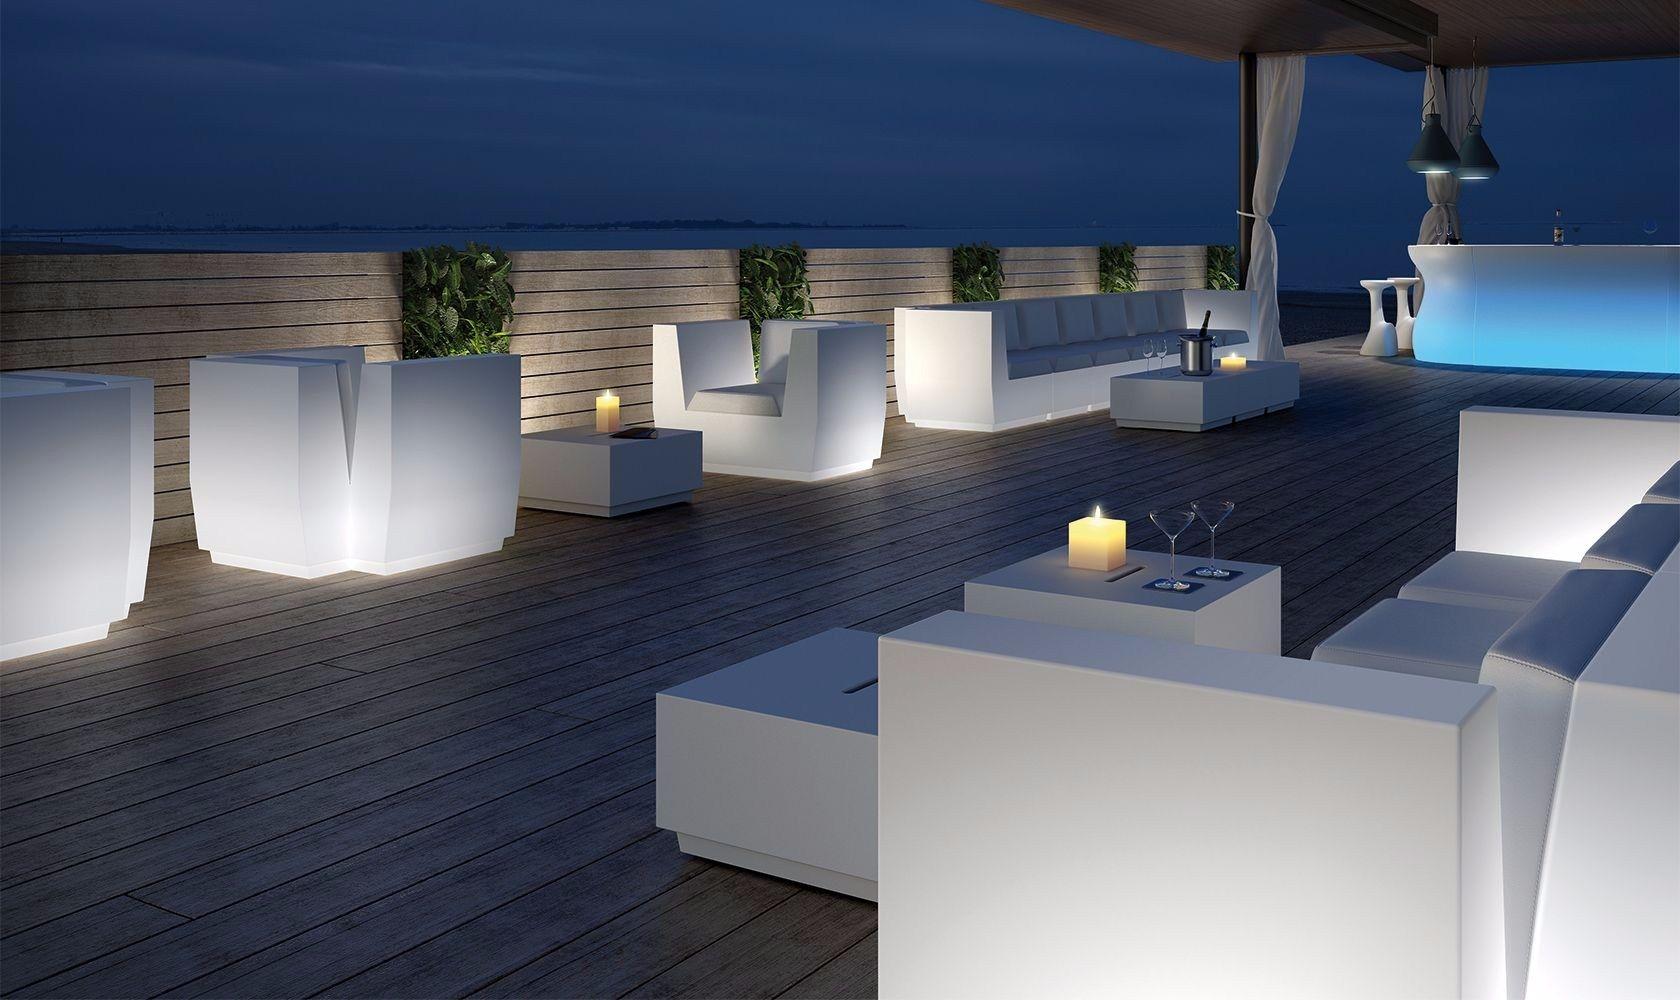 Corner Lighting Big Cut Corner Light By Plust Design Matali Crasset